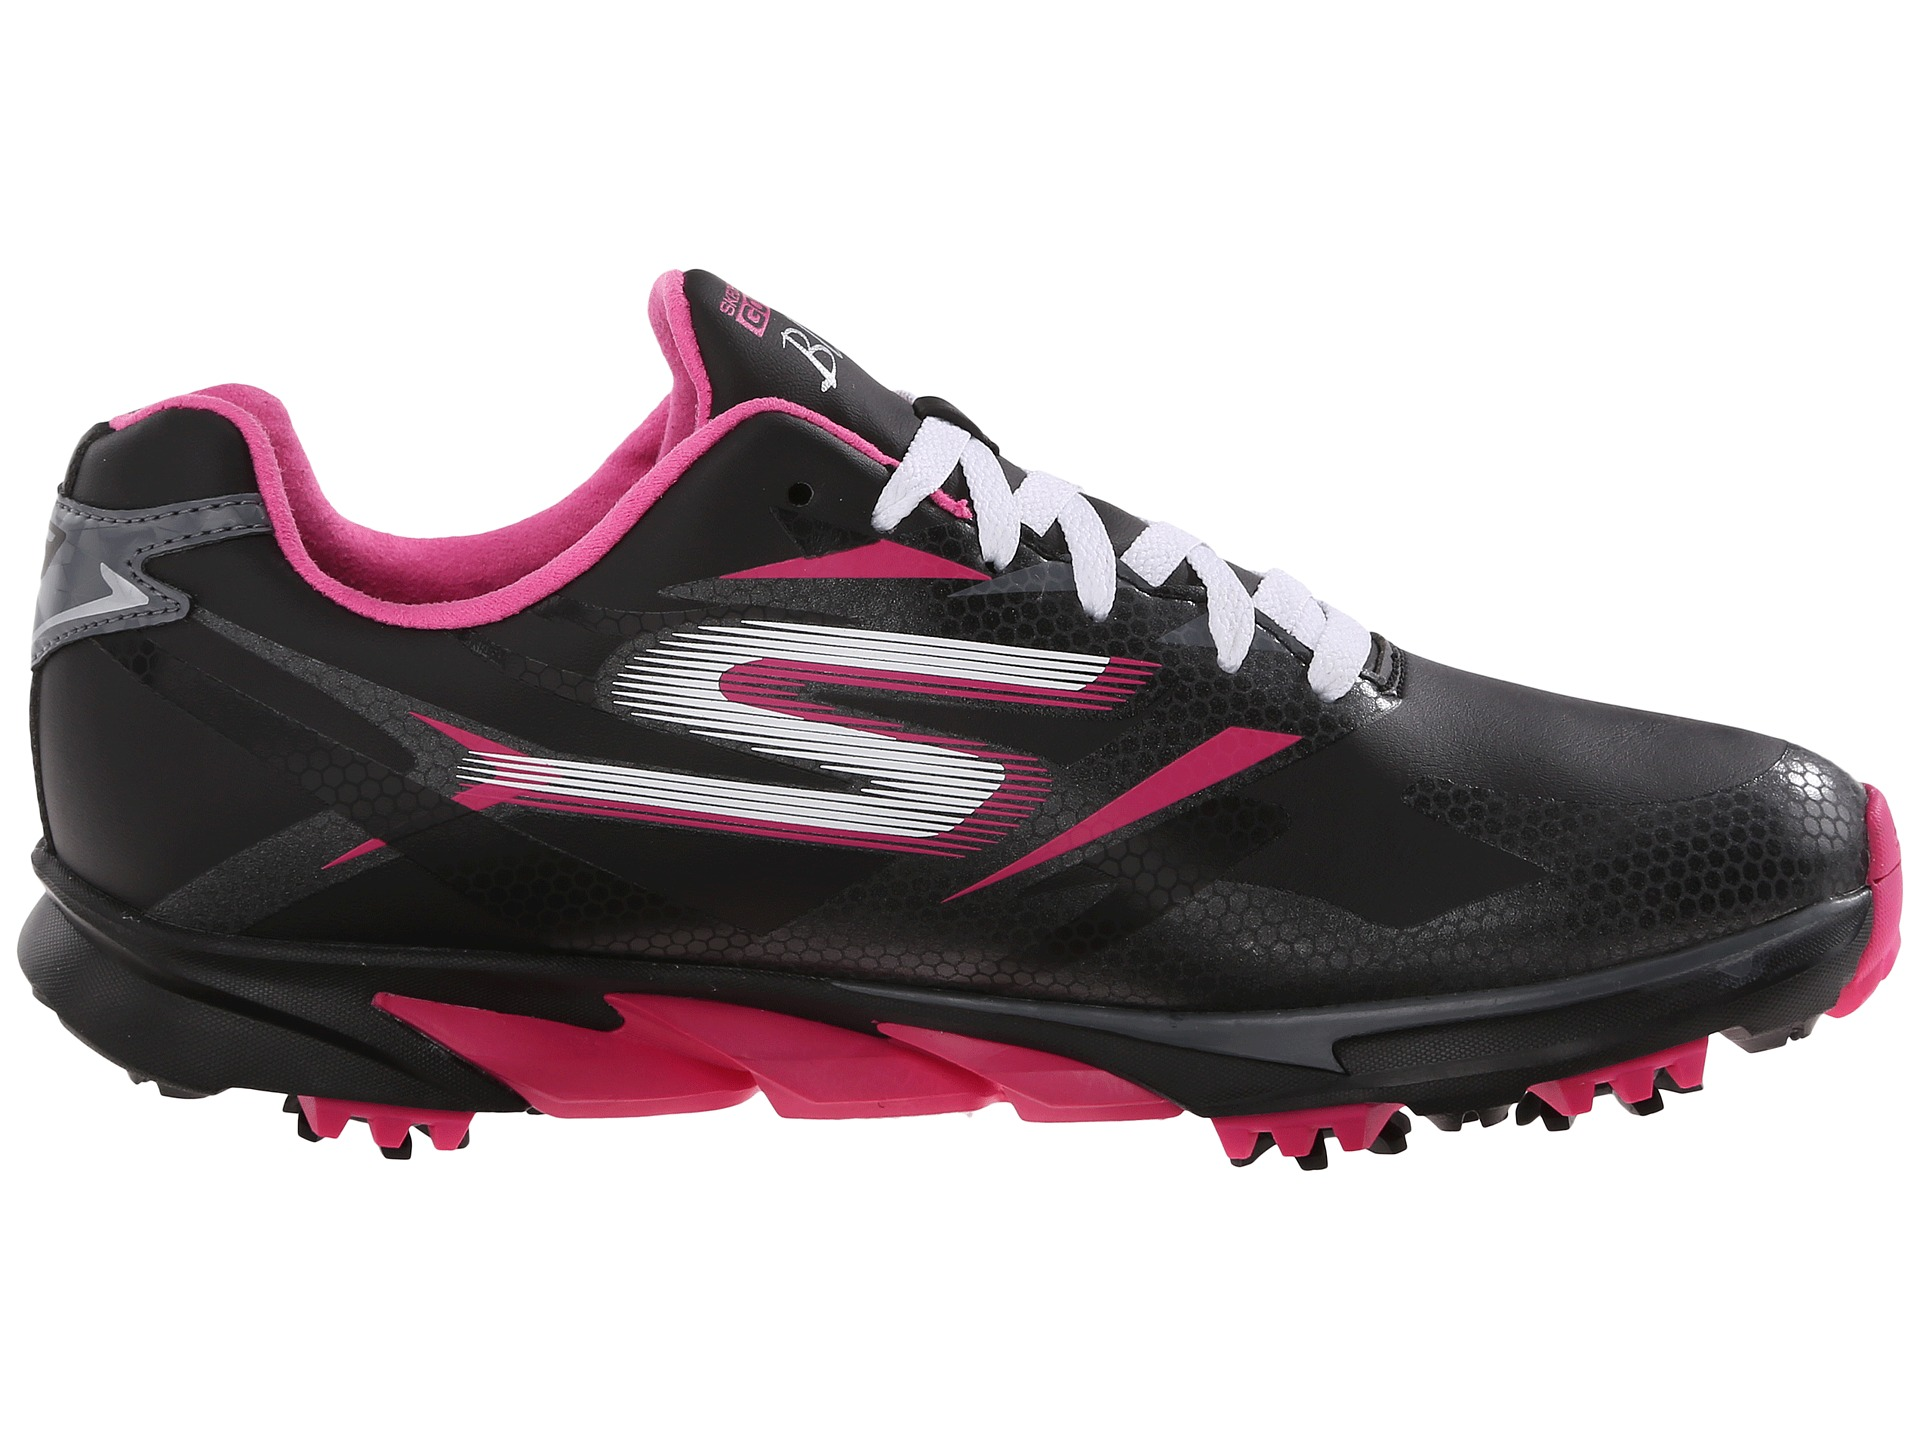 Skechers Performance Men S Go Golf Blade Golf Shoe